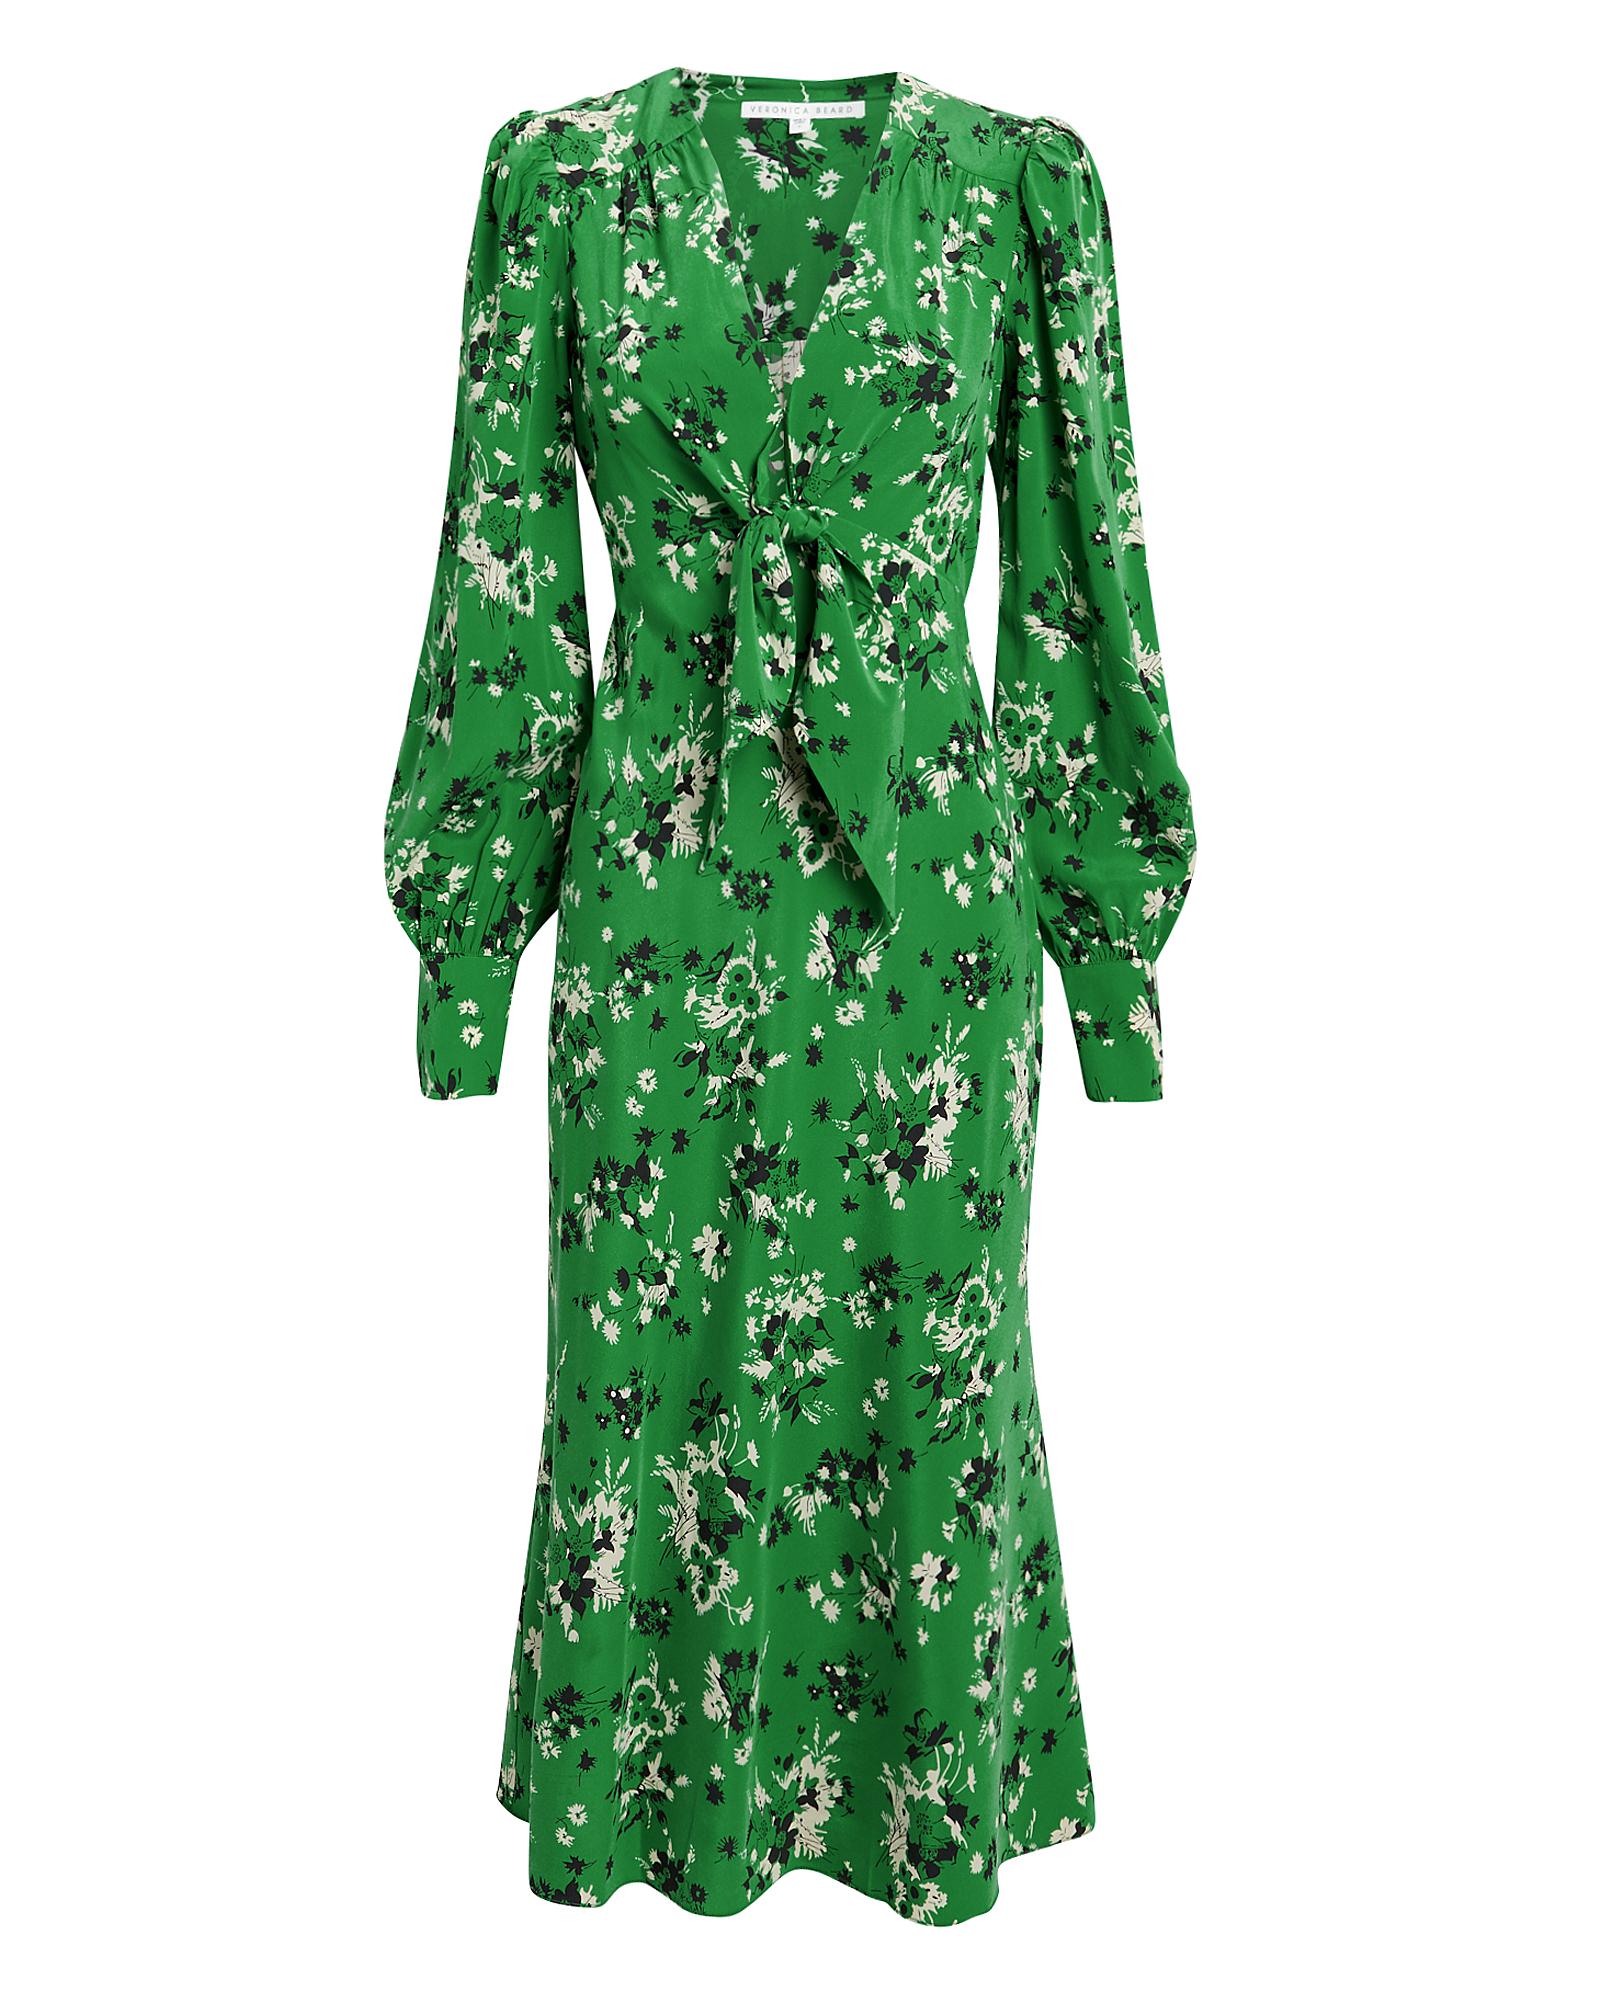 Veronica Beard Dresses VERONICA BEARD AMBER FLORAL MIDI DRESS  GREEN/FLORAL 8